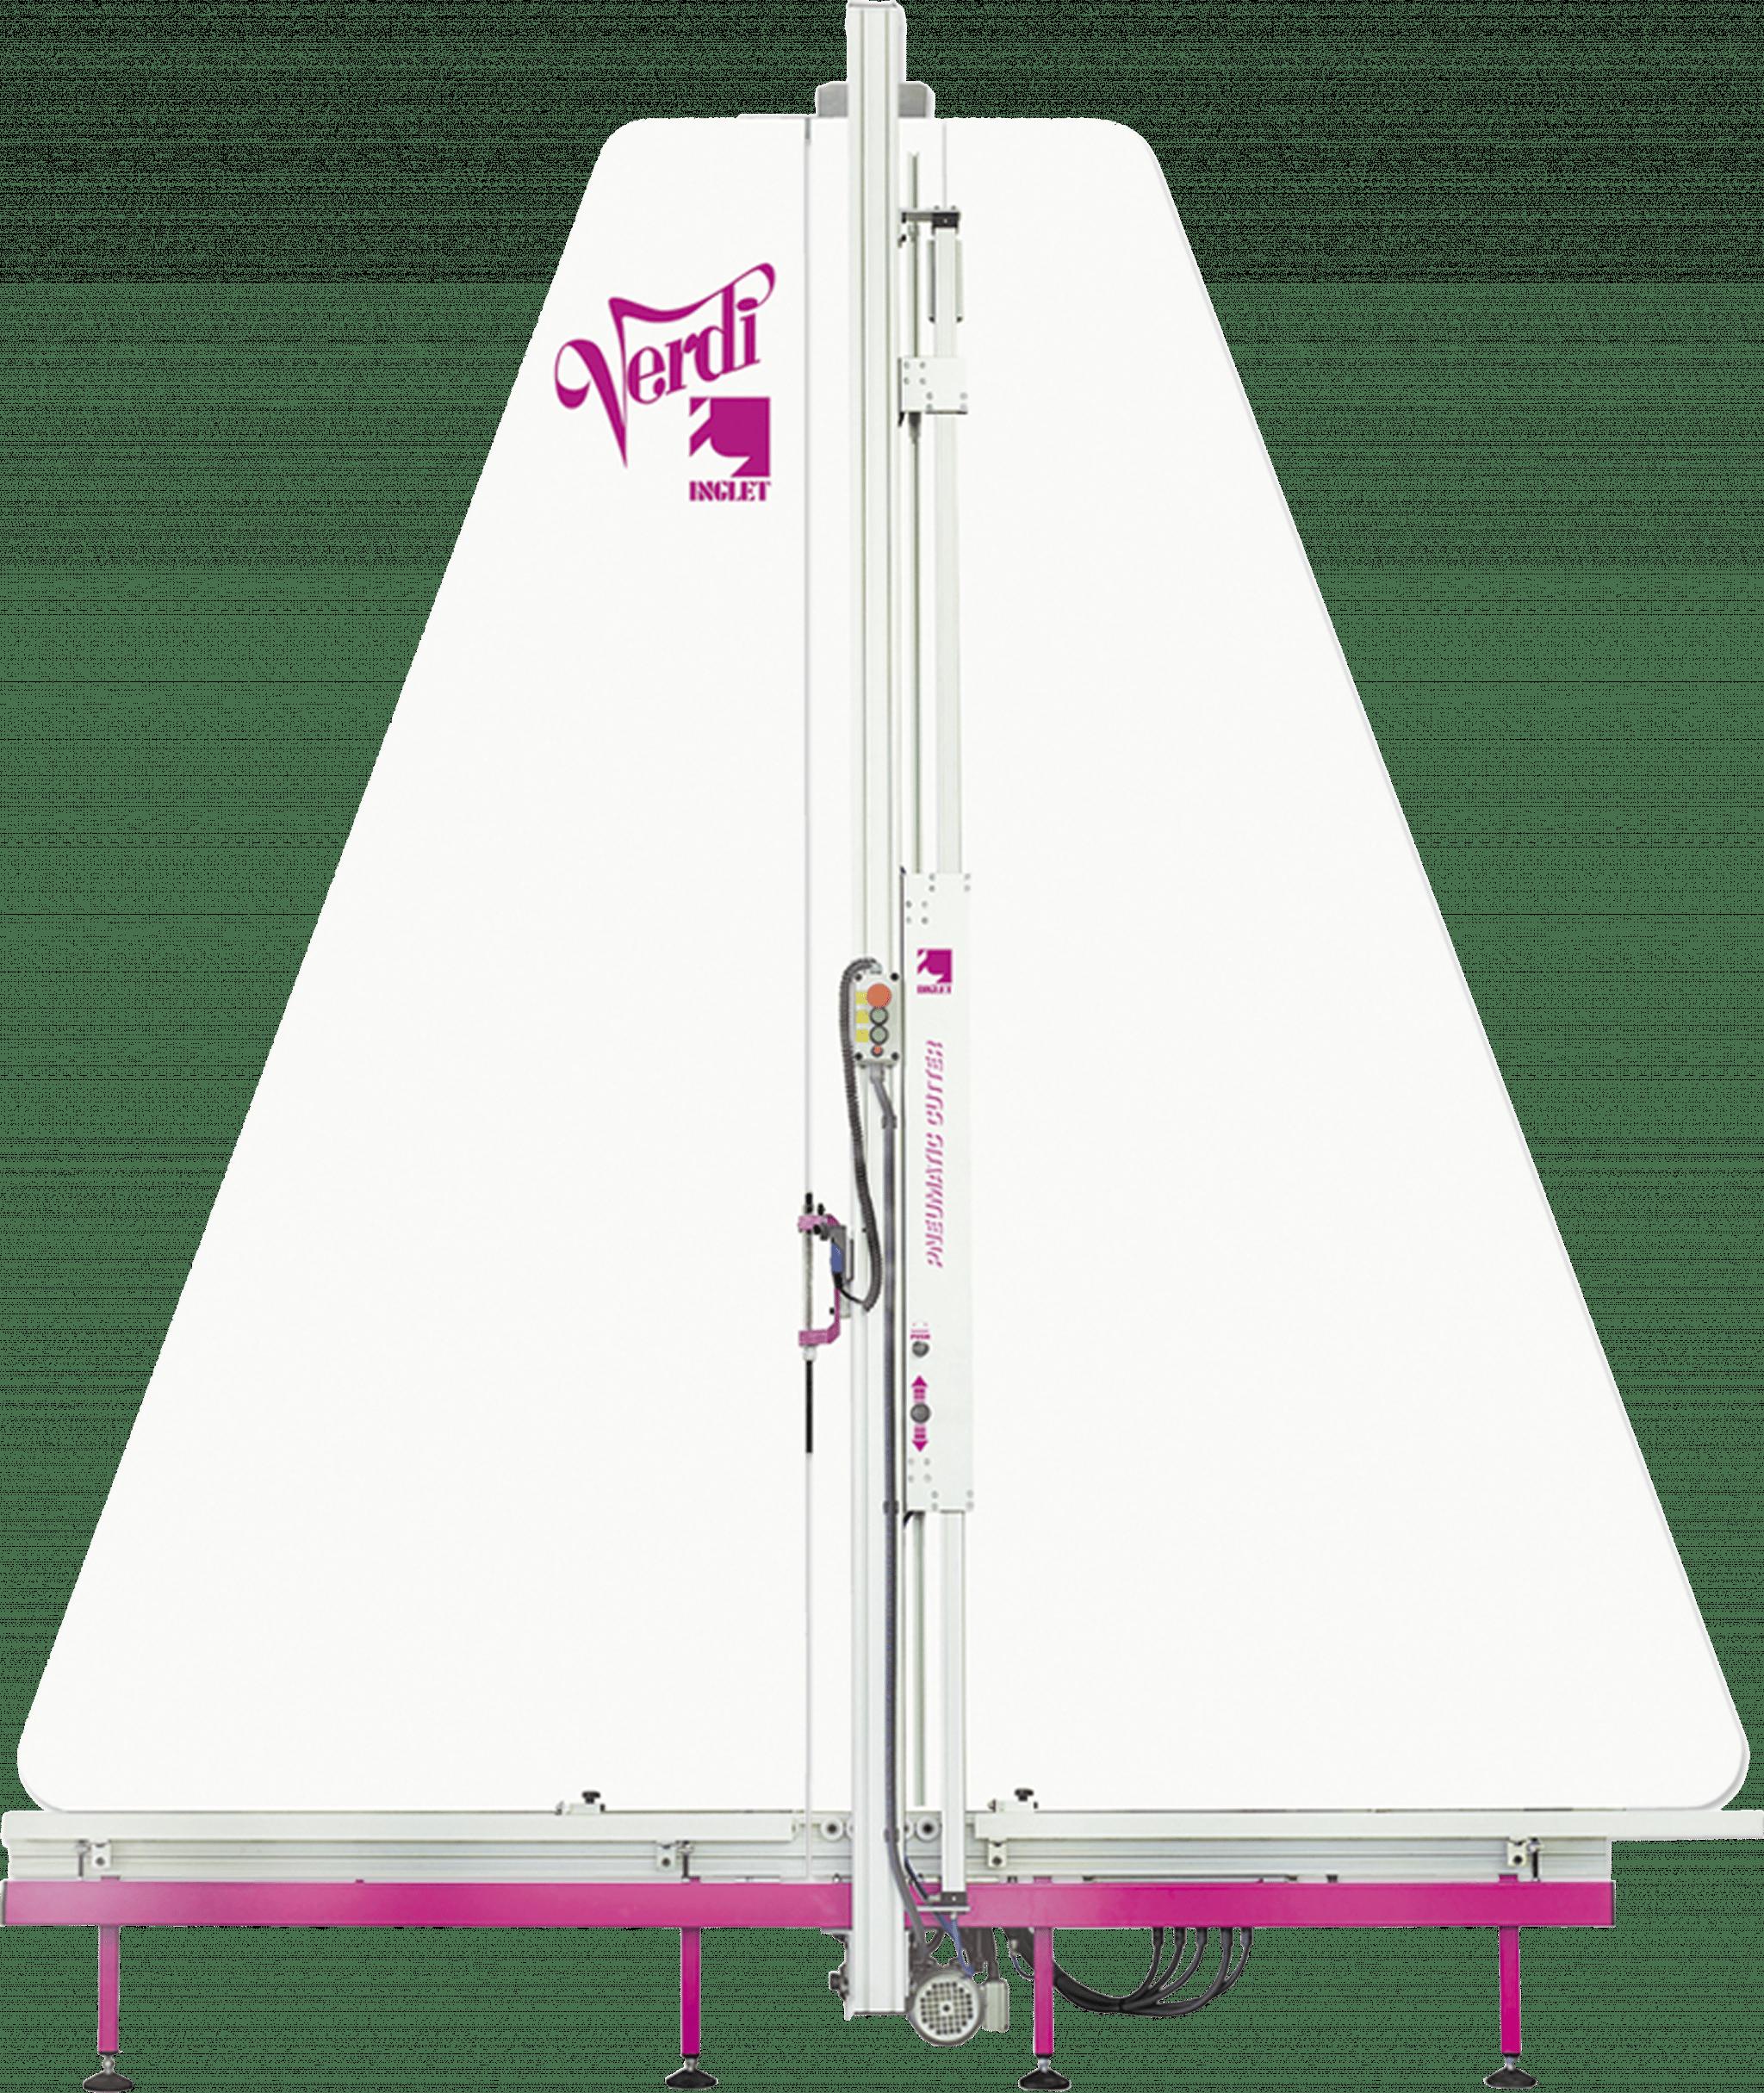 Inglet Verdi Twin 210